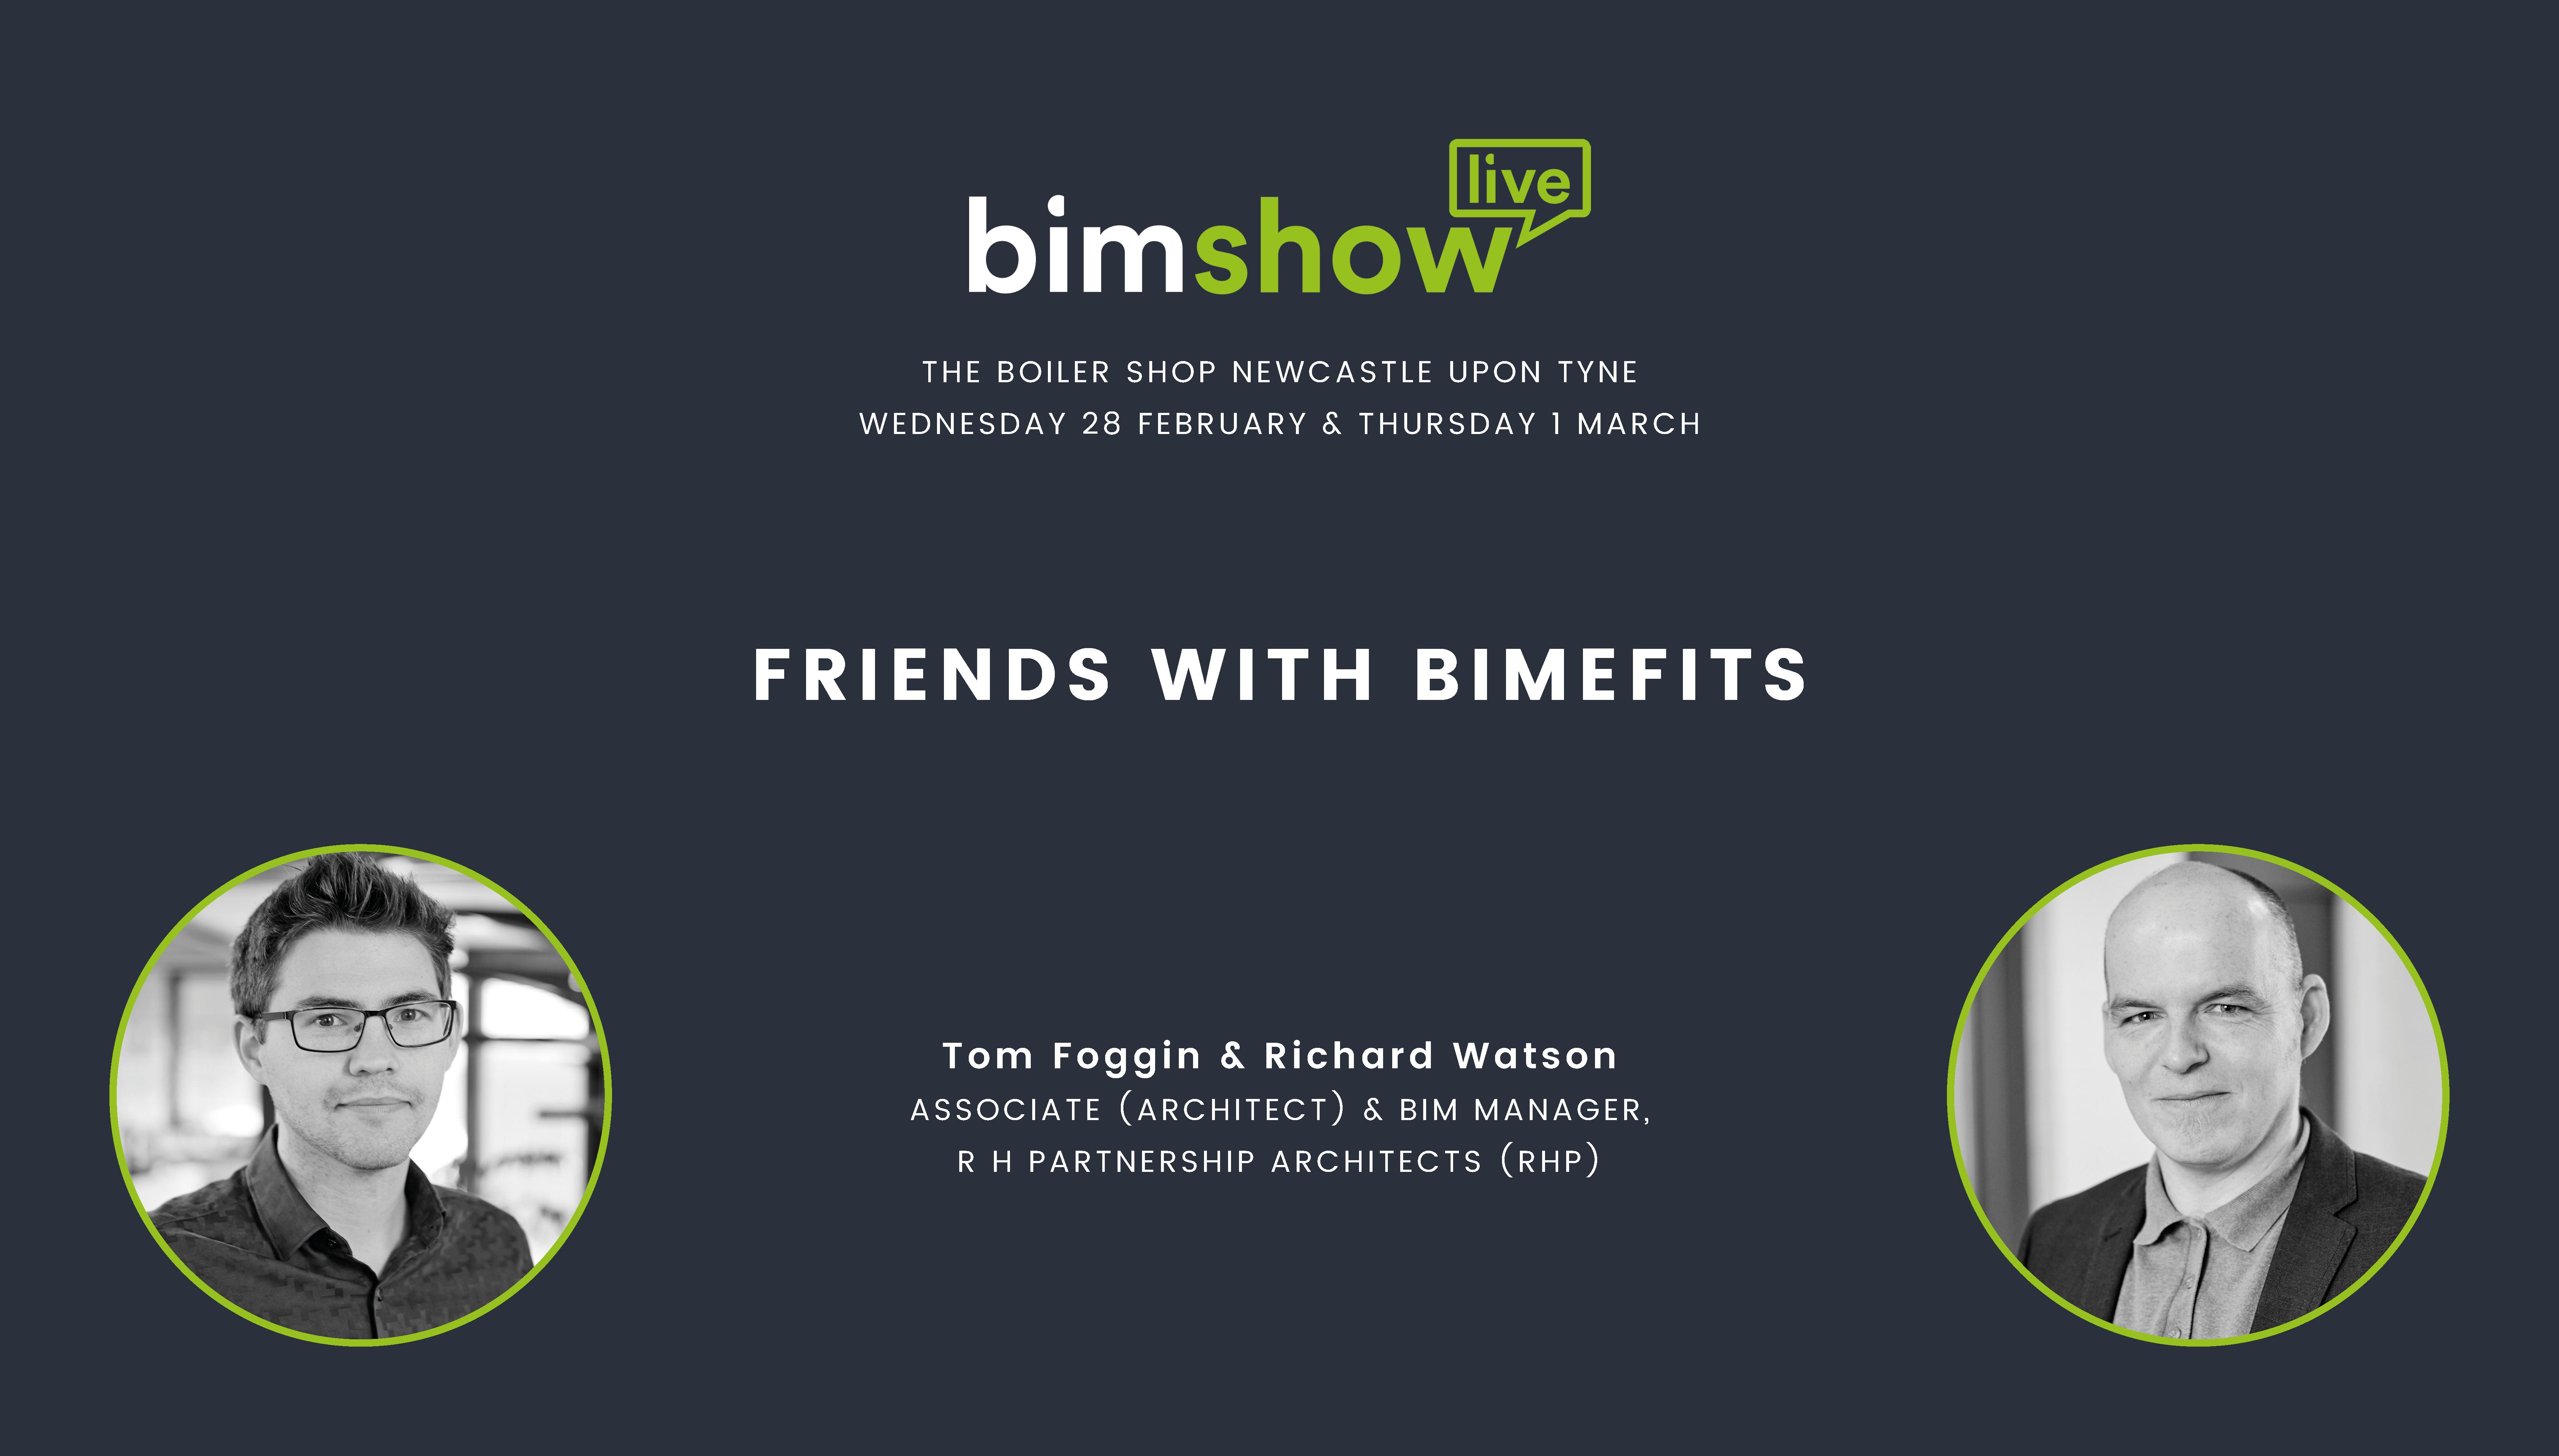 Tom Foggin and Richard Watson to Speak at BIM Show Live